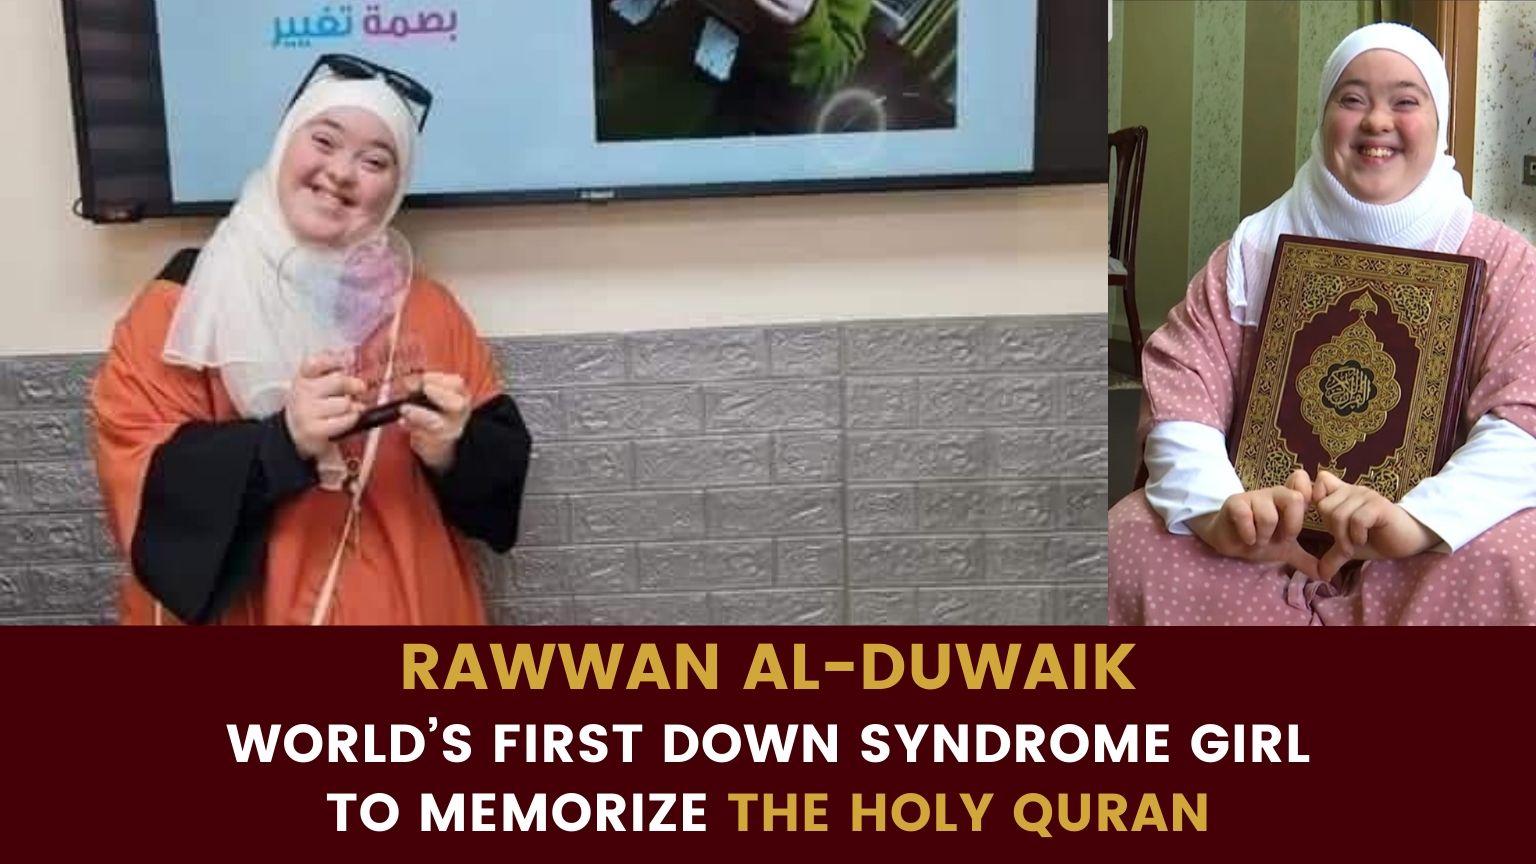 Rawwan al-Duwaik, World's 1st Down Syndrome Girl To Memorize The Holy Quran